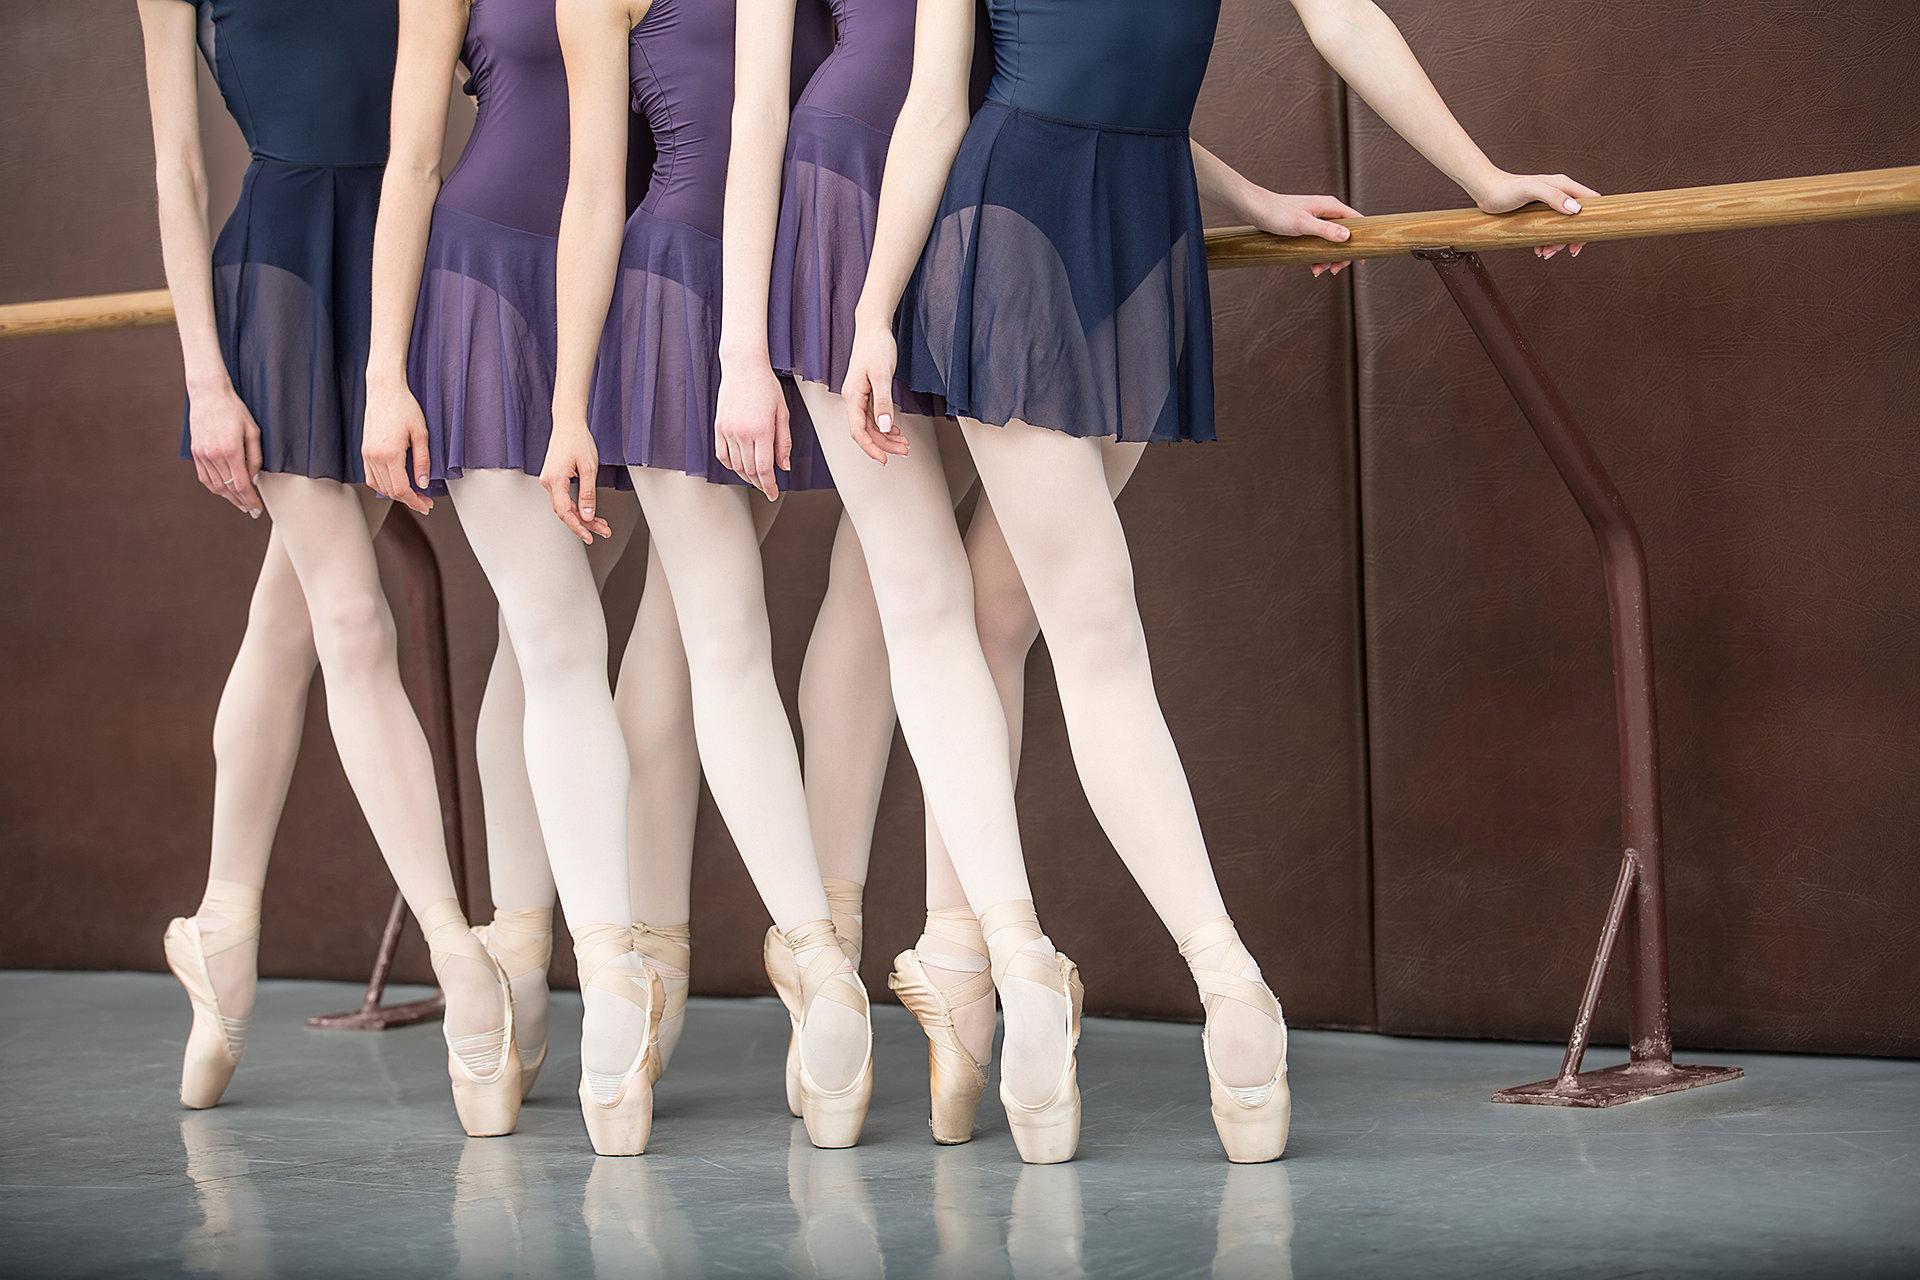 Фото балерин в зале 15 фотография